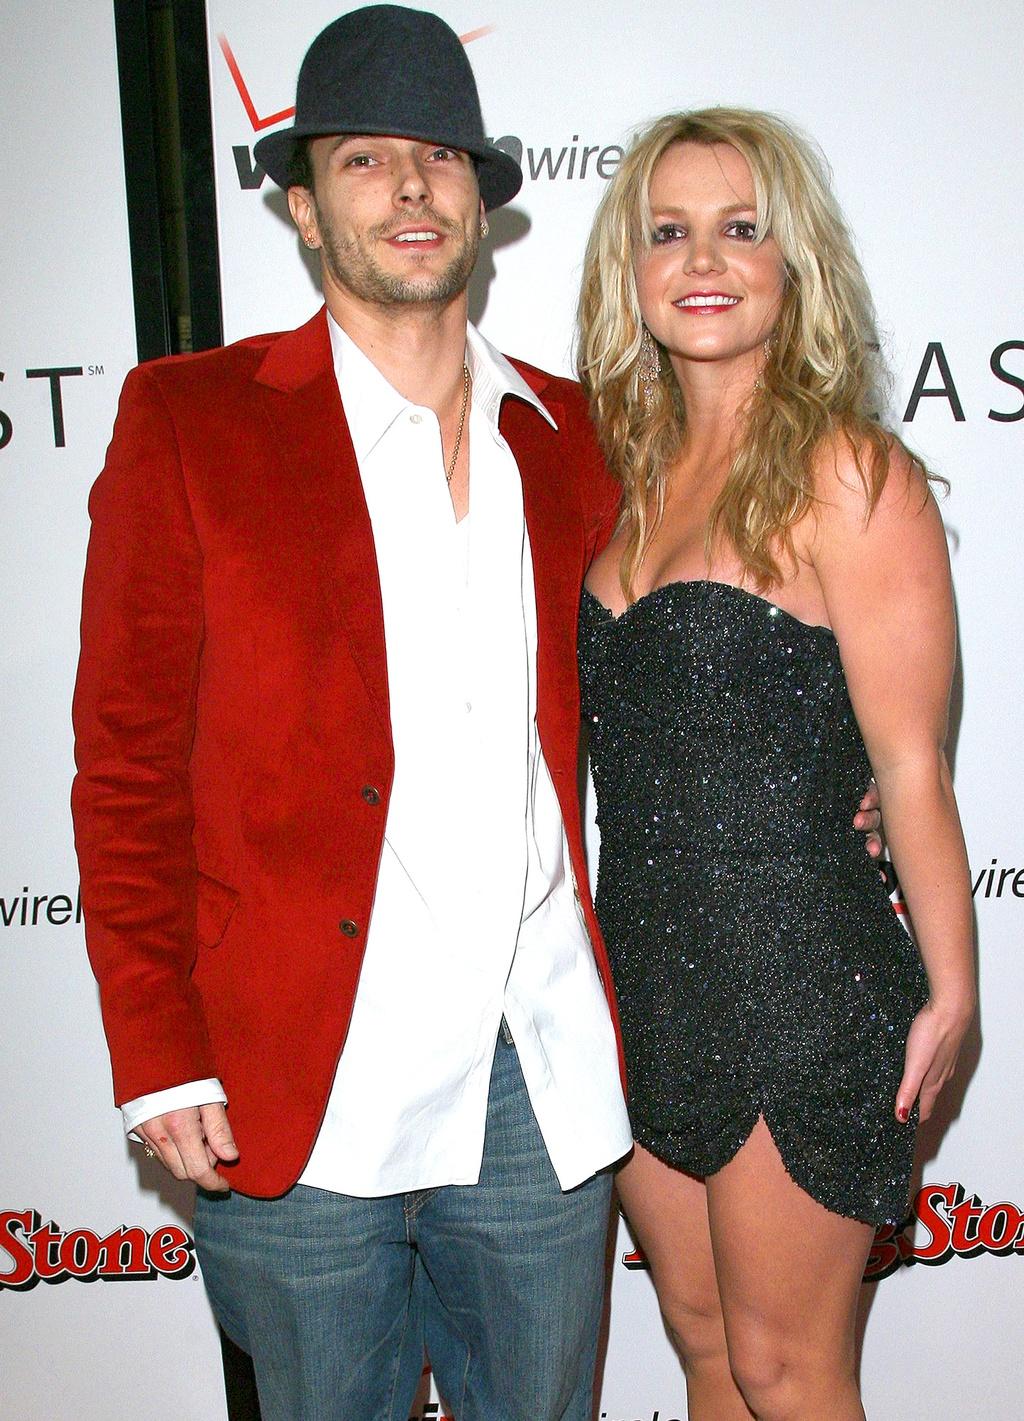 Britney Spears - cong chua nhac pop va cu truot dai trong su nghiep hinh anh 12 20.jpg